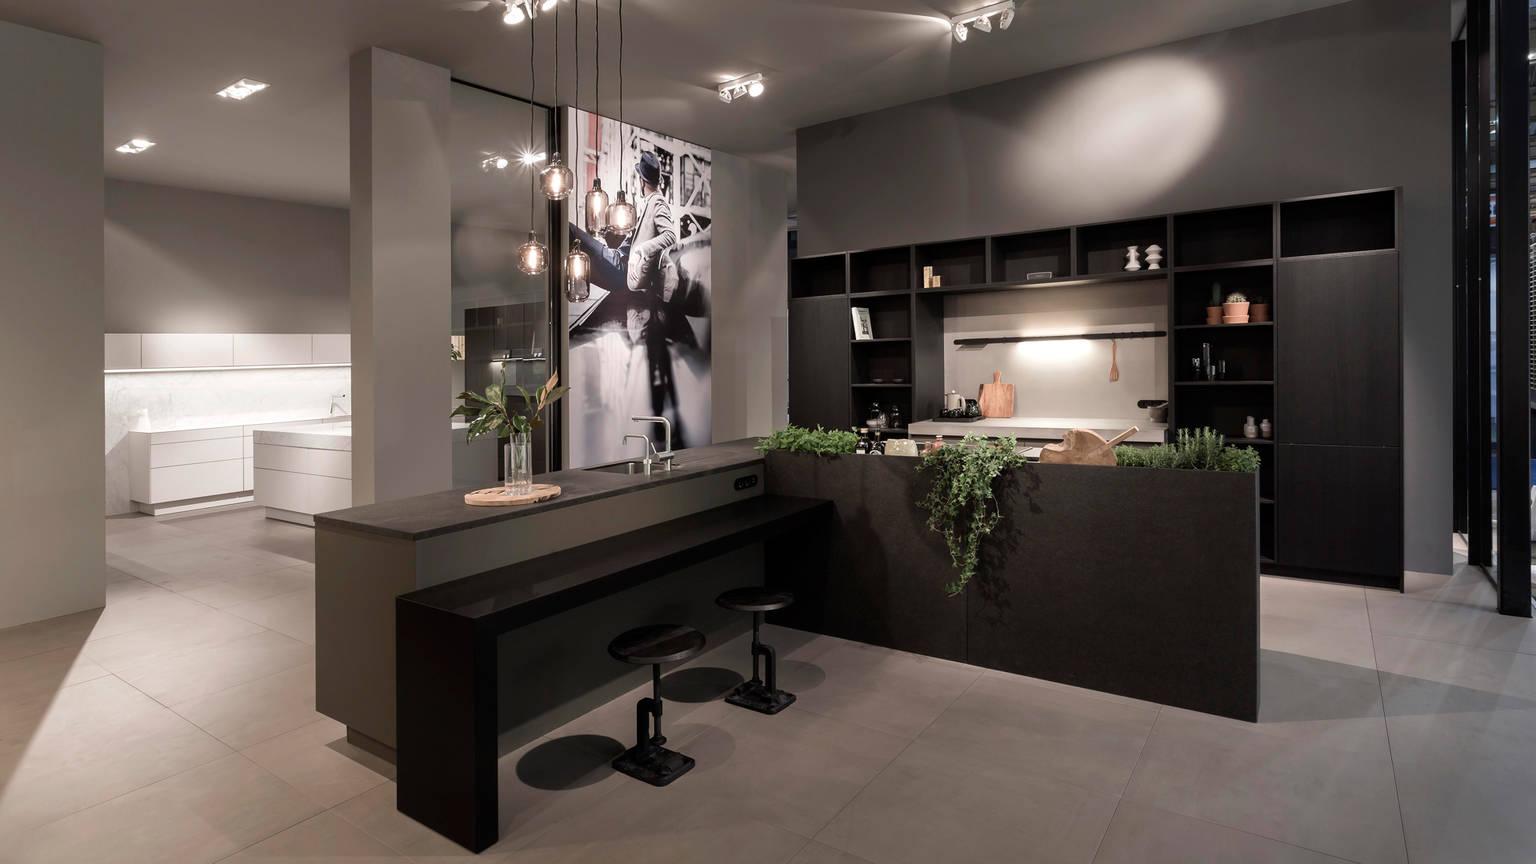 batibouw fair 2016. Black Bedroom Furniture Sets. Home Design Ideas